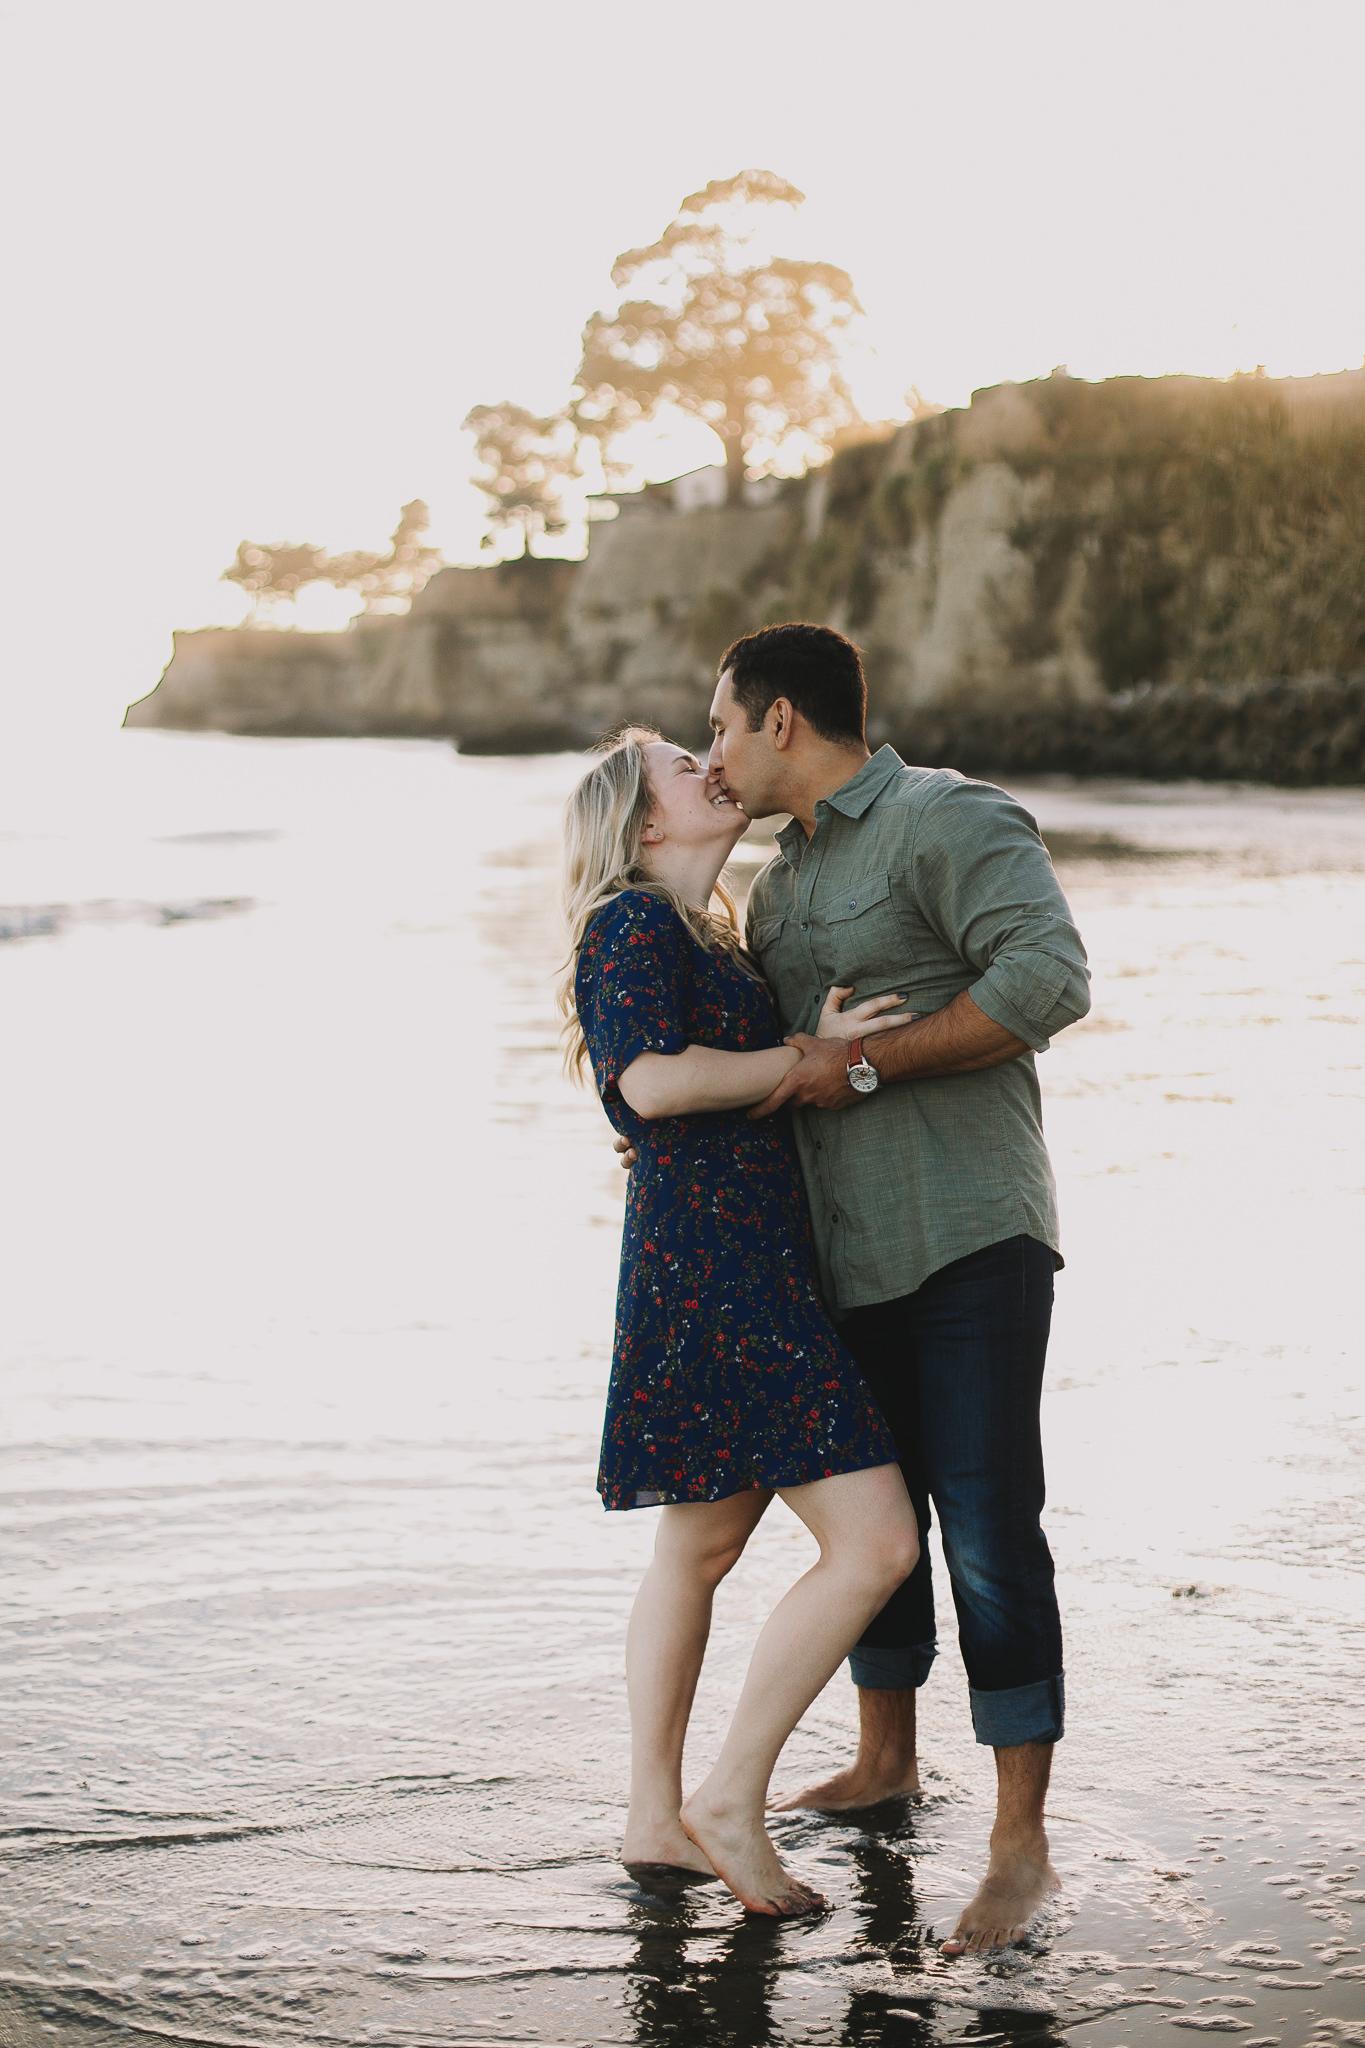 Archer Inspired Photography Capitola Beach Santa Cruz Wedding Engagement Lifestyle Session Photographer-90.jpg